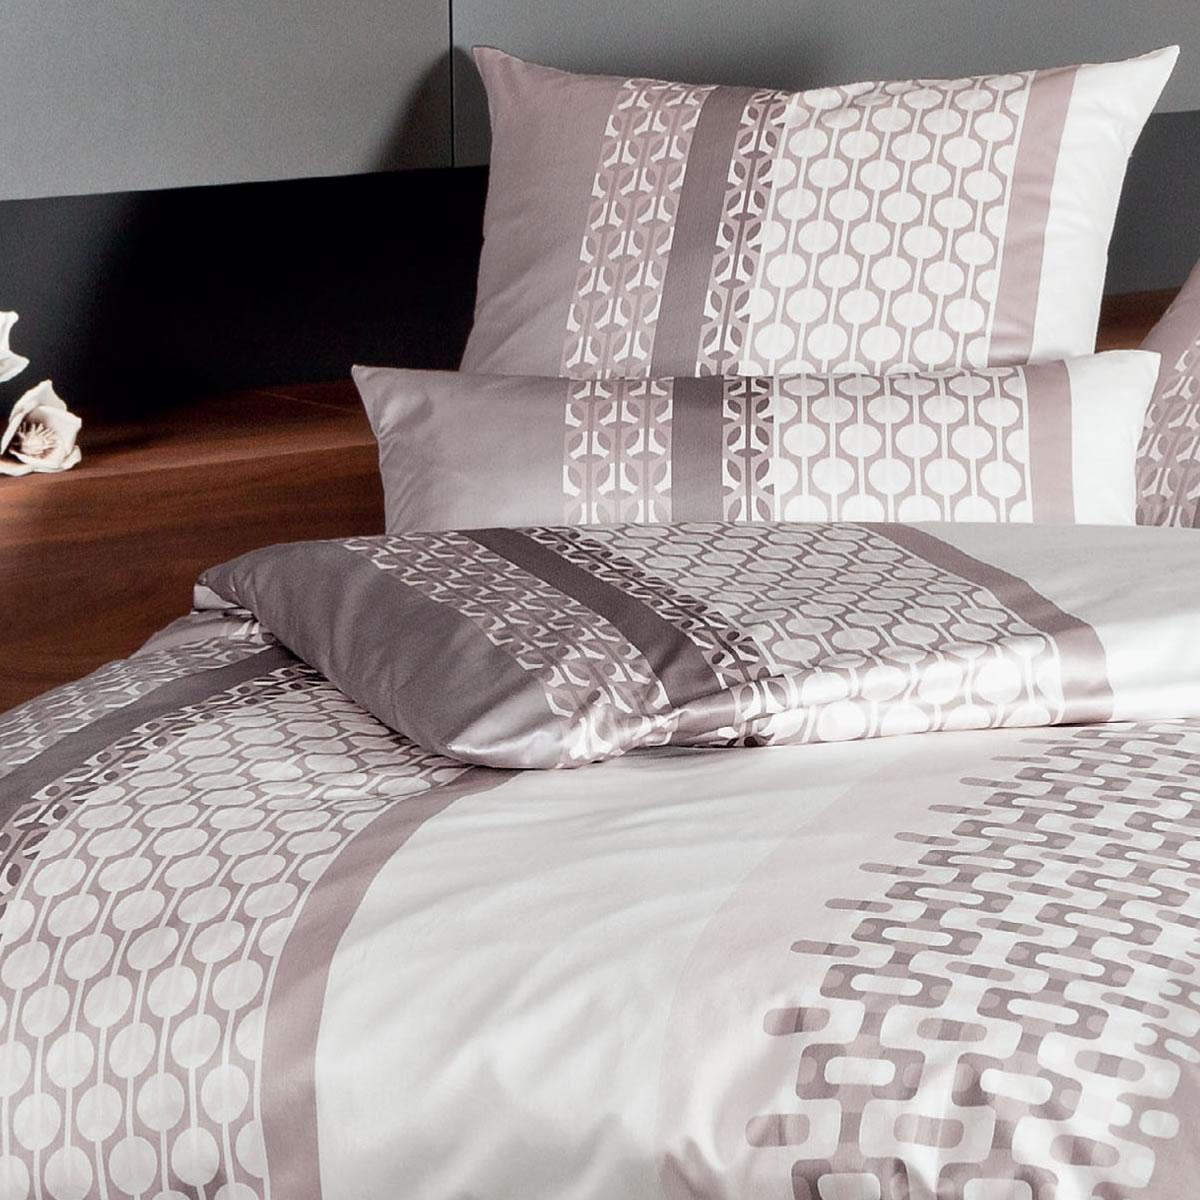 janine interlock fein jersey bettw sche carmen 53036 05 zartmauve. Black Bedroom Furniture Sets. Home Design Ideas